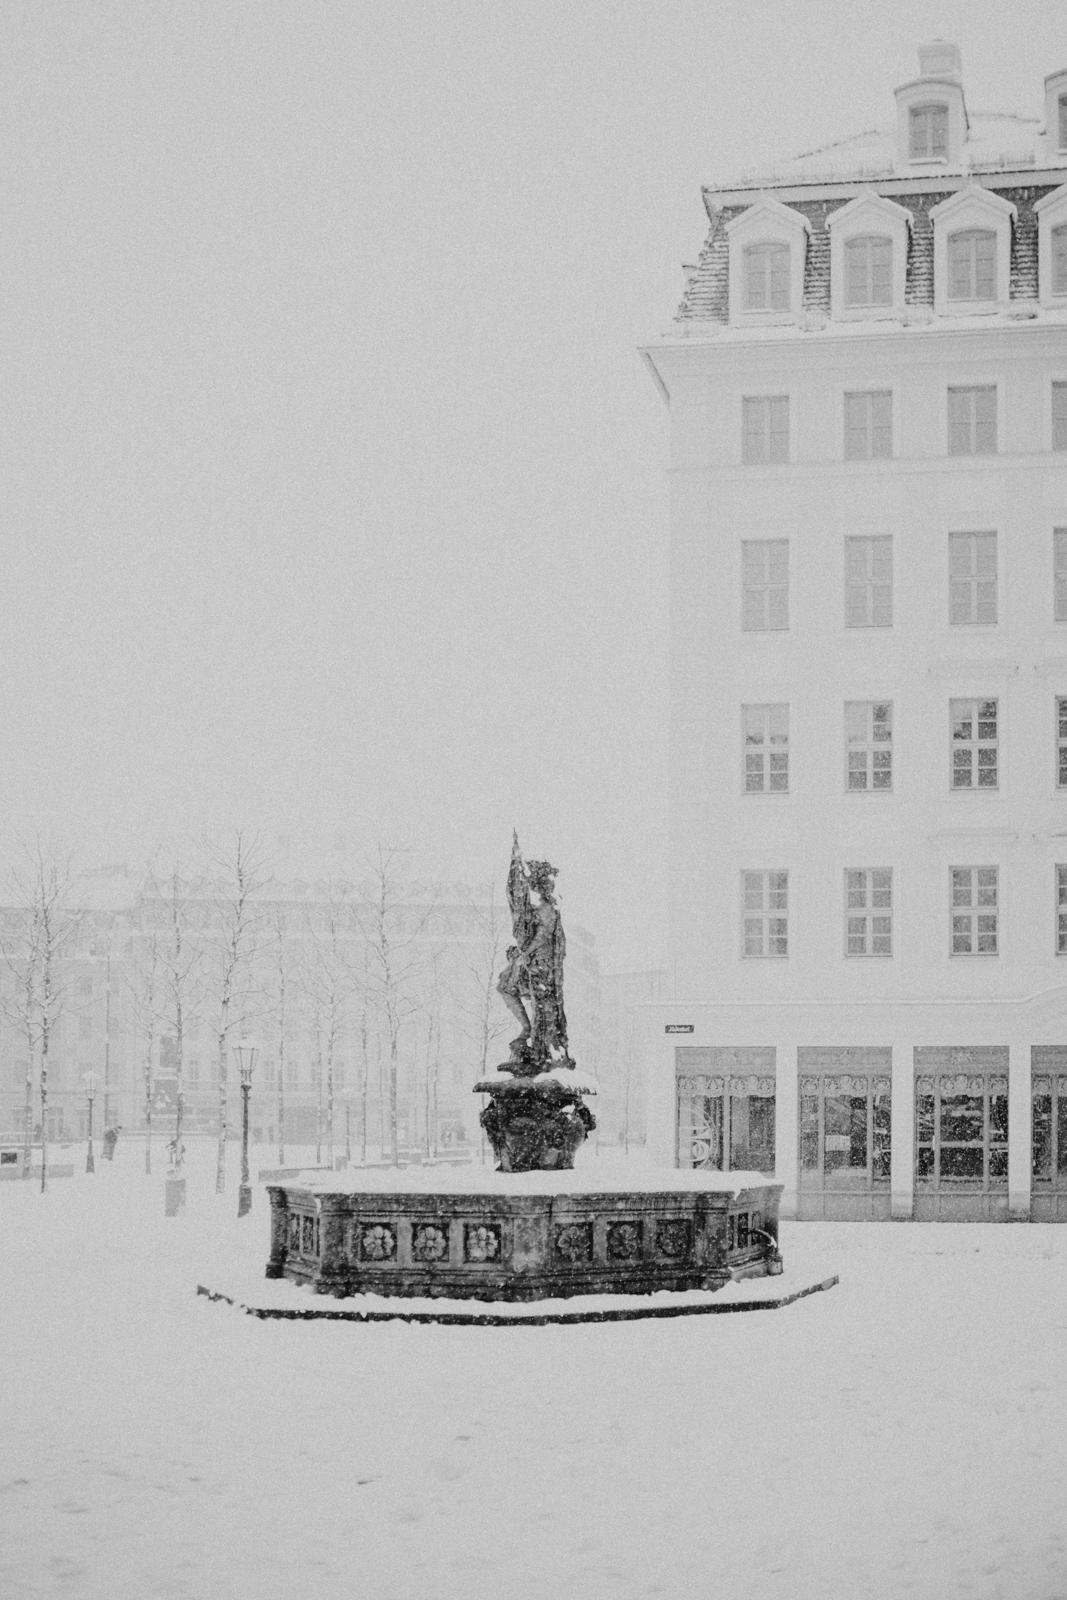 Winterspaziergang durch die in Dresdner Altstadt 2019